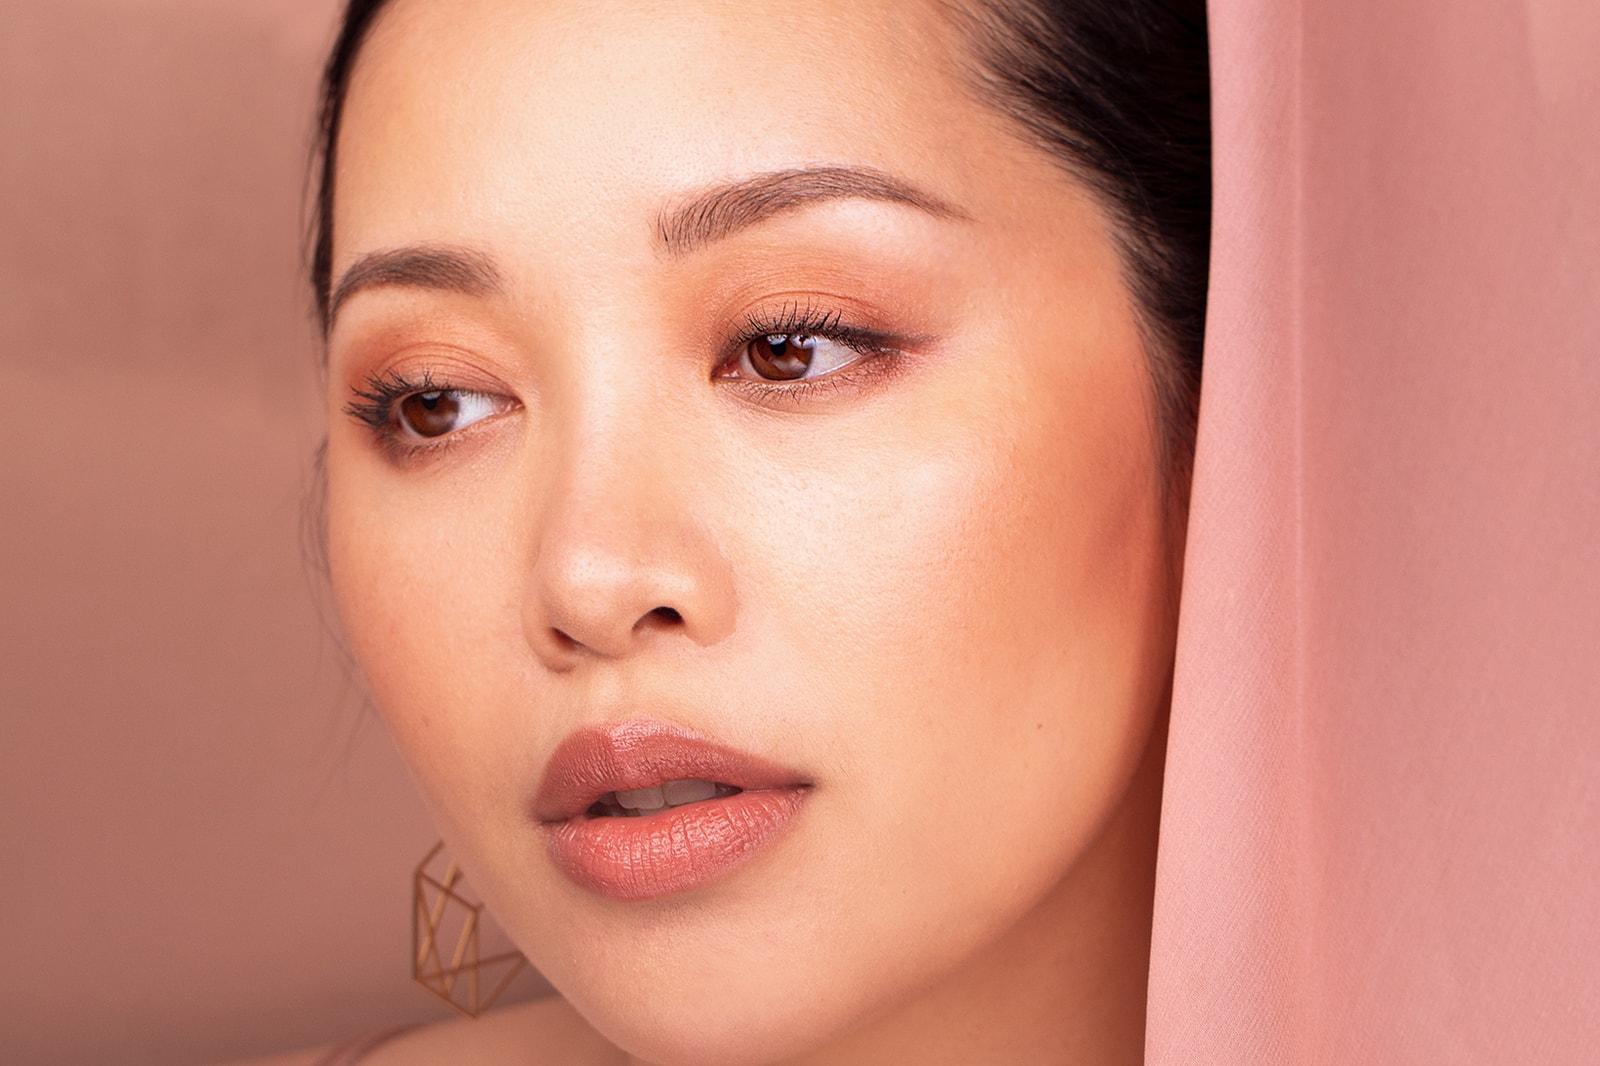 Michelle Phan EM Cosmetics Beauty Makeup YouTuber Pick Me Up Volume Length Mascara Lip Cushion Illustrative Eyeliner Heaven's Glow Radiant Veil Blush